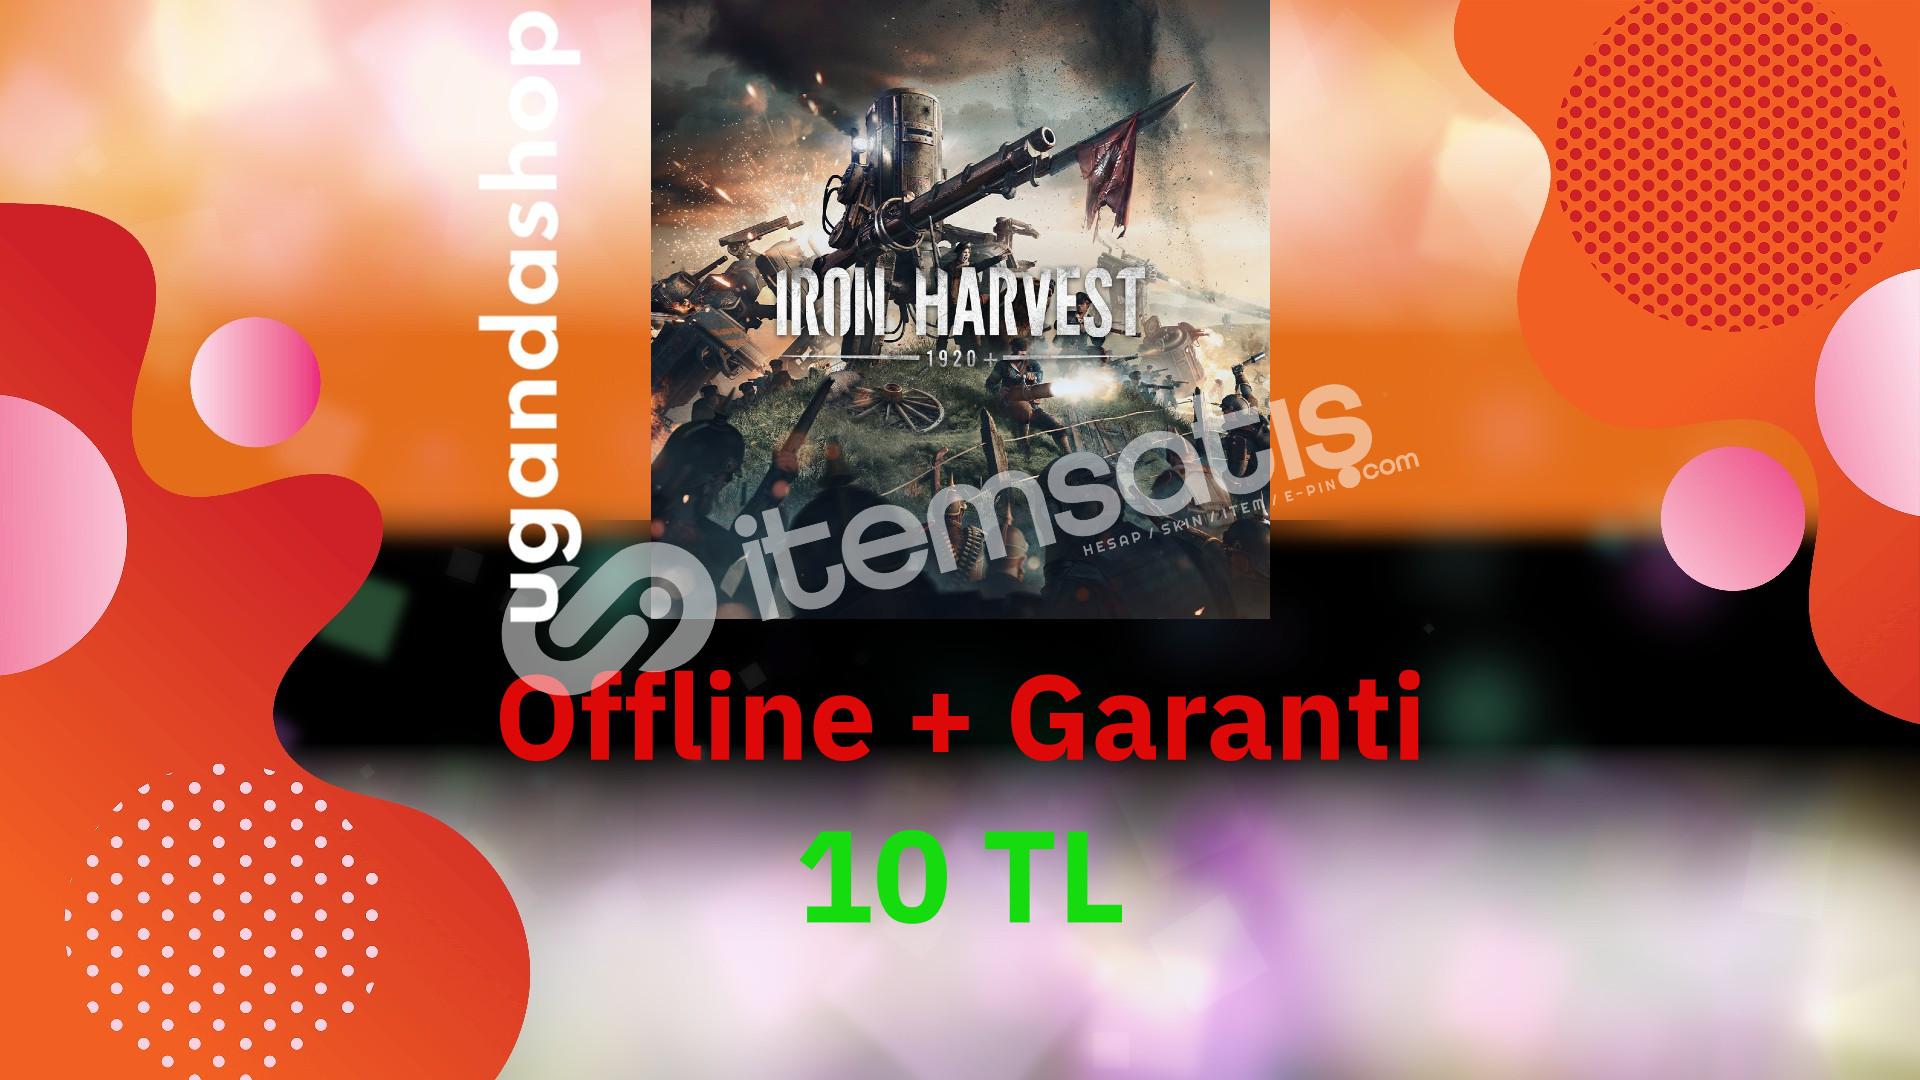 Iron Harvest Offline Steam Hesap + Garanti